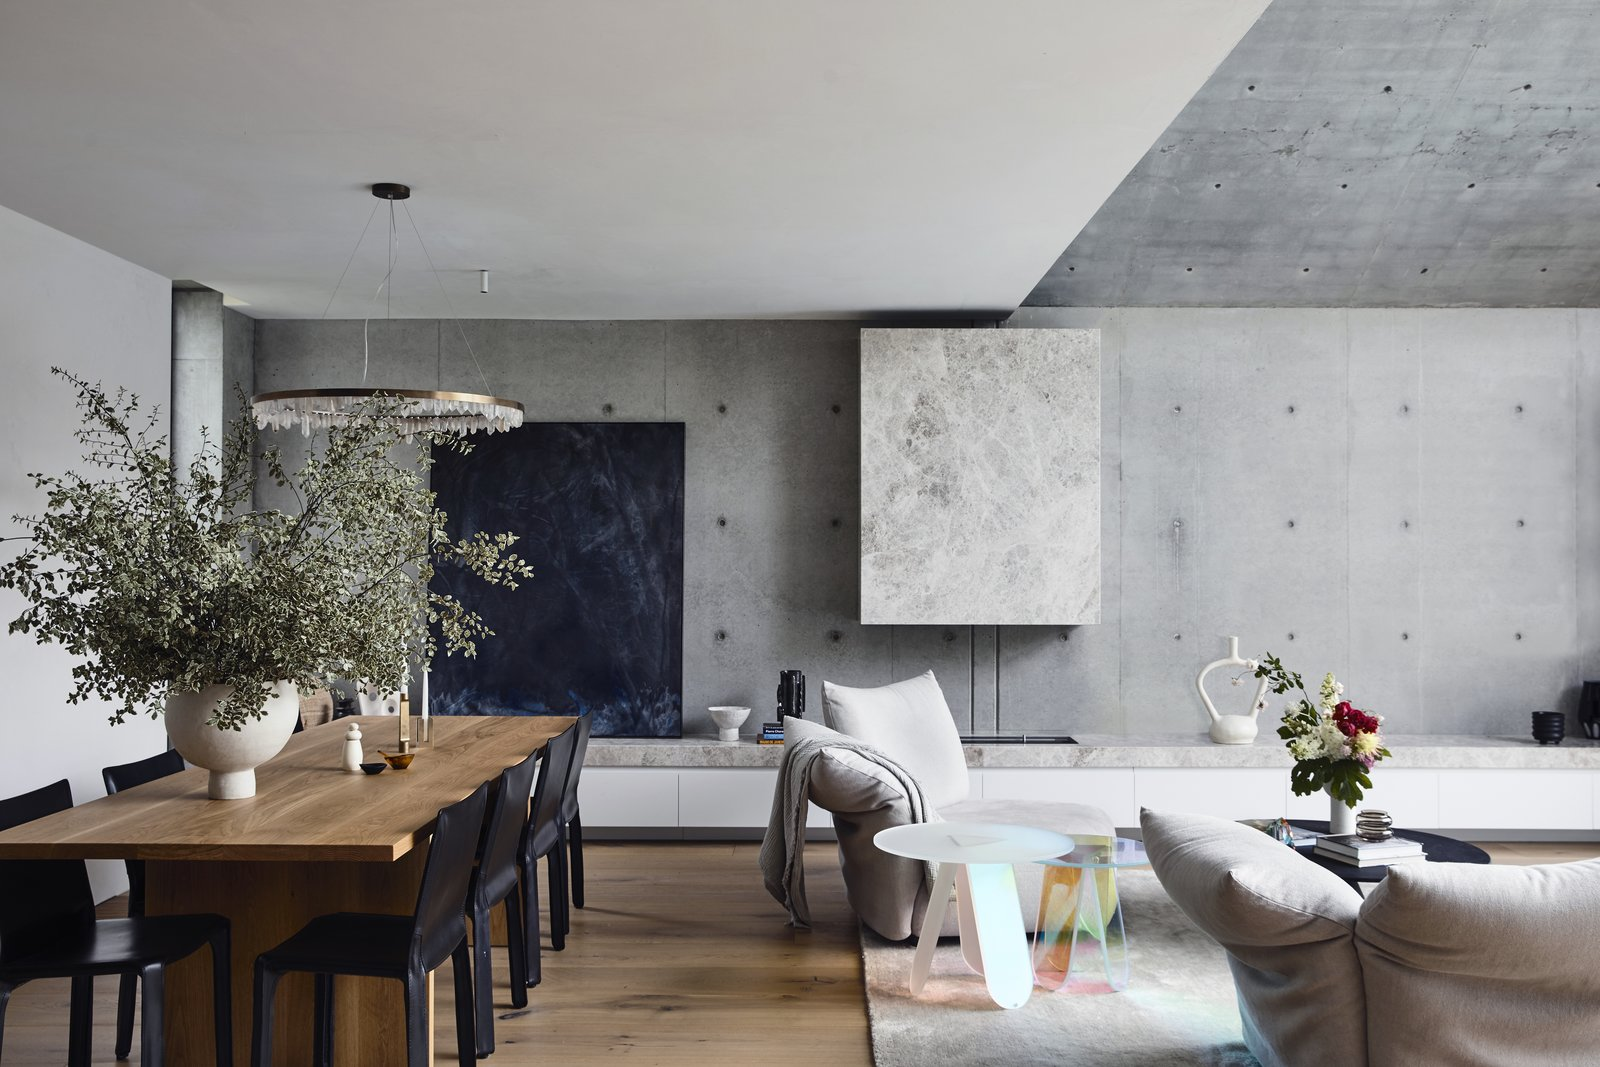 Scandizzo House, Kennon+ great room